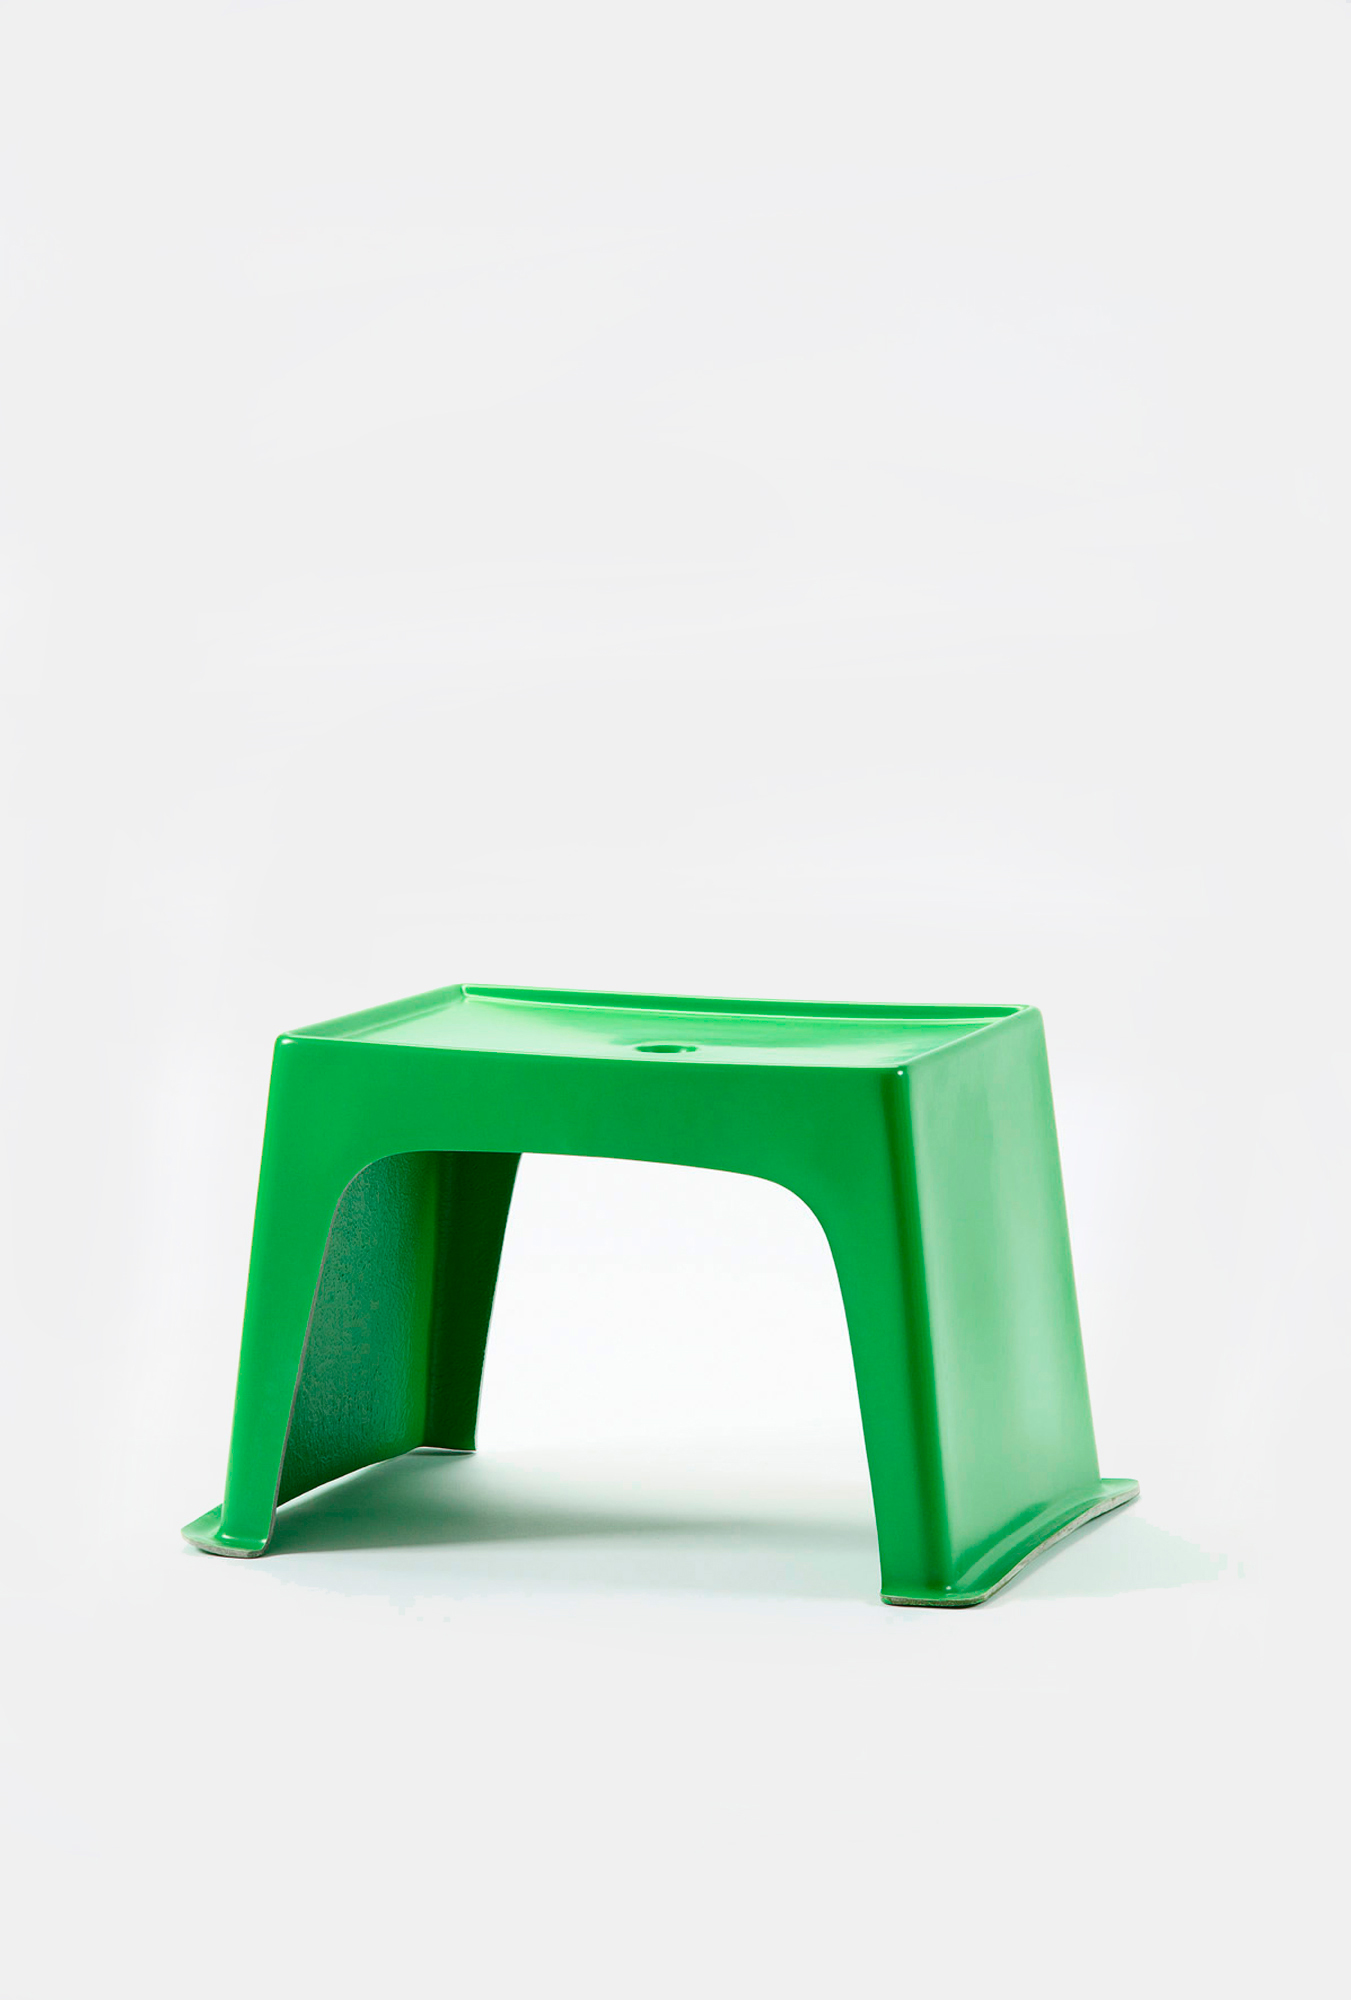 tisch juni r kindgerecht und strapazierf hig l ffler onlineshop. Black Bedroom Furniture Sets. Home Design Ideas